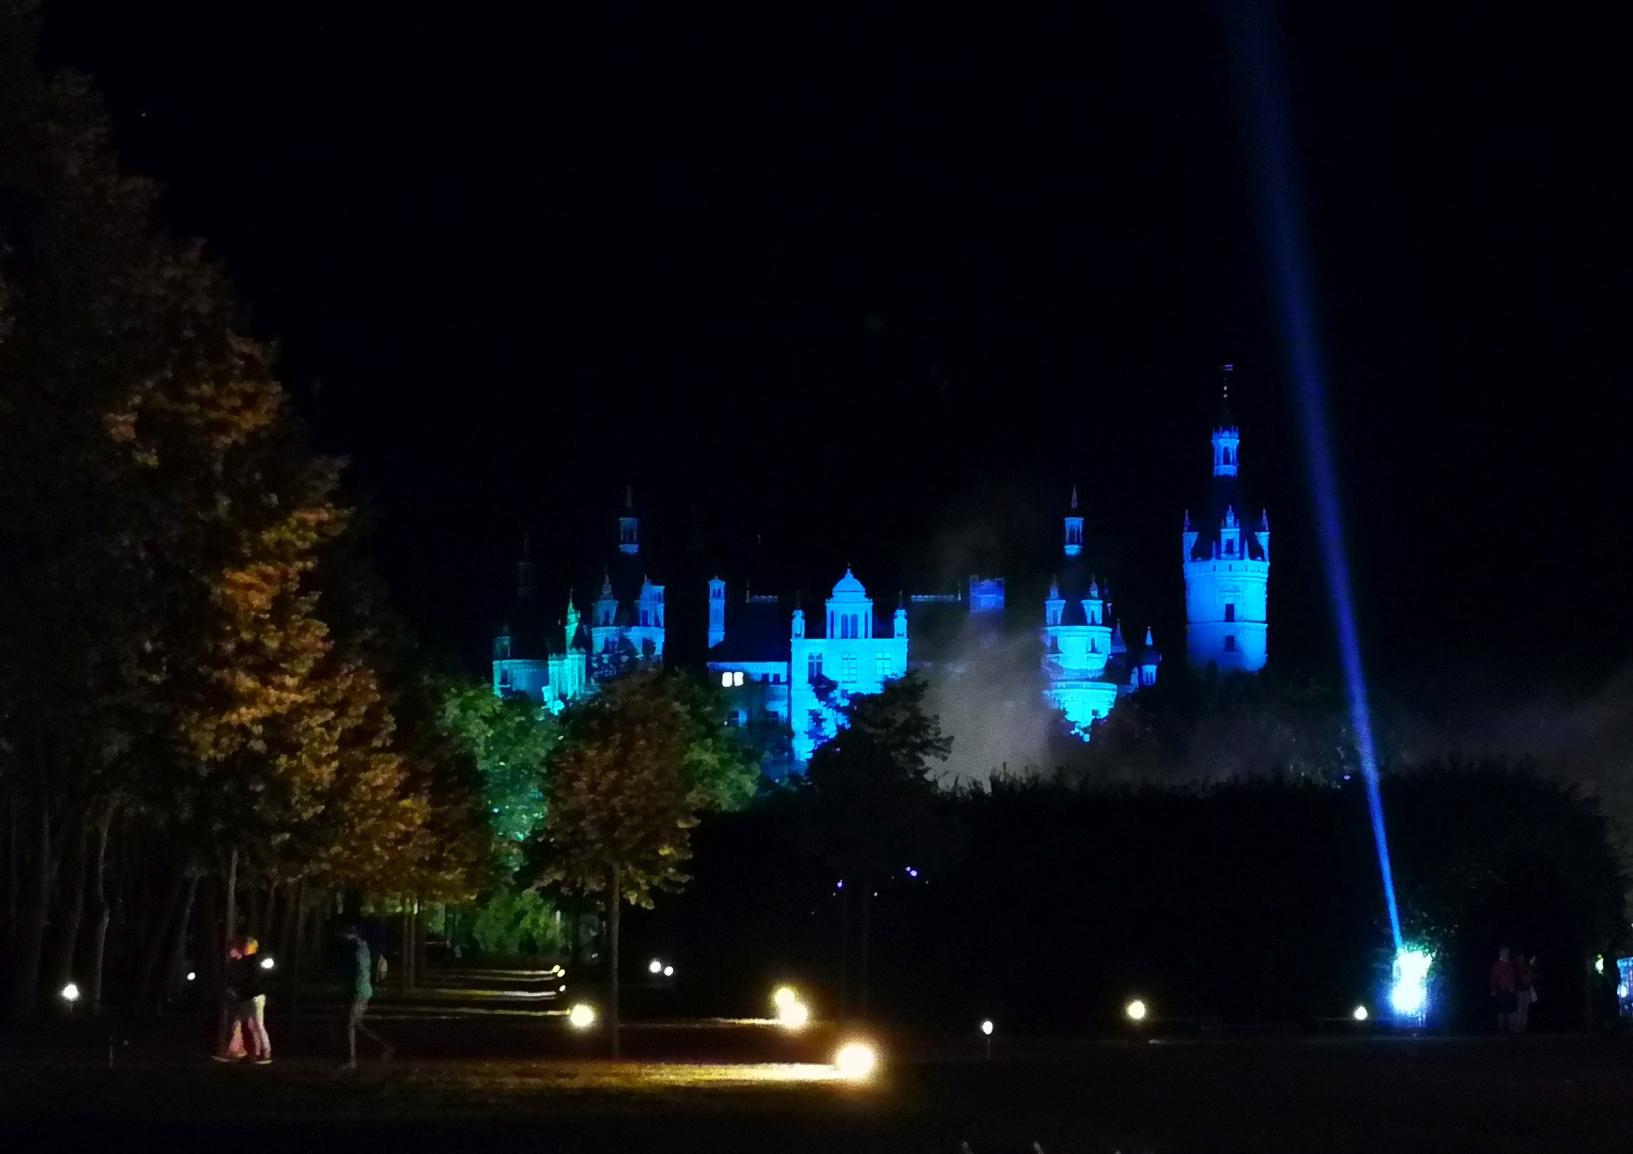 Schlossgartenlust_2019_Schwerinl_IMG_20190803_233301